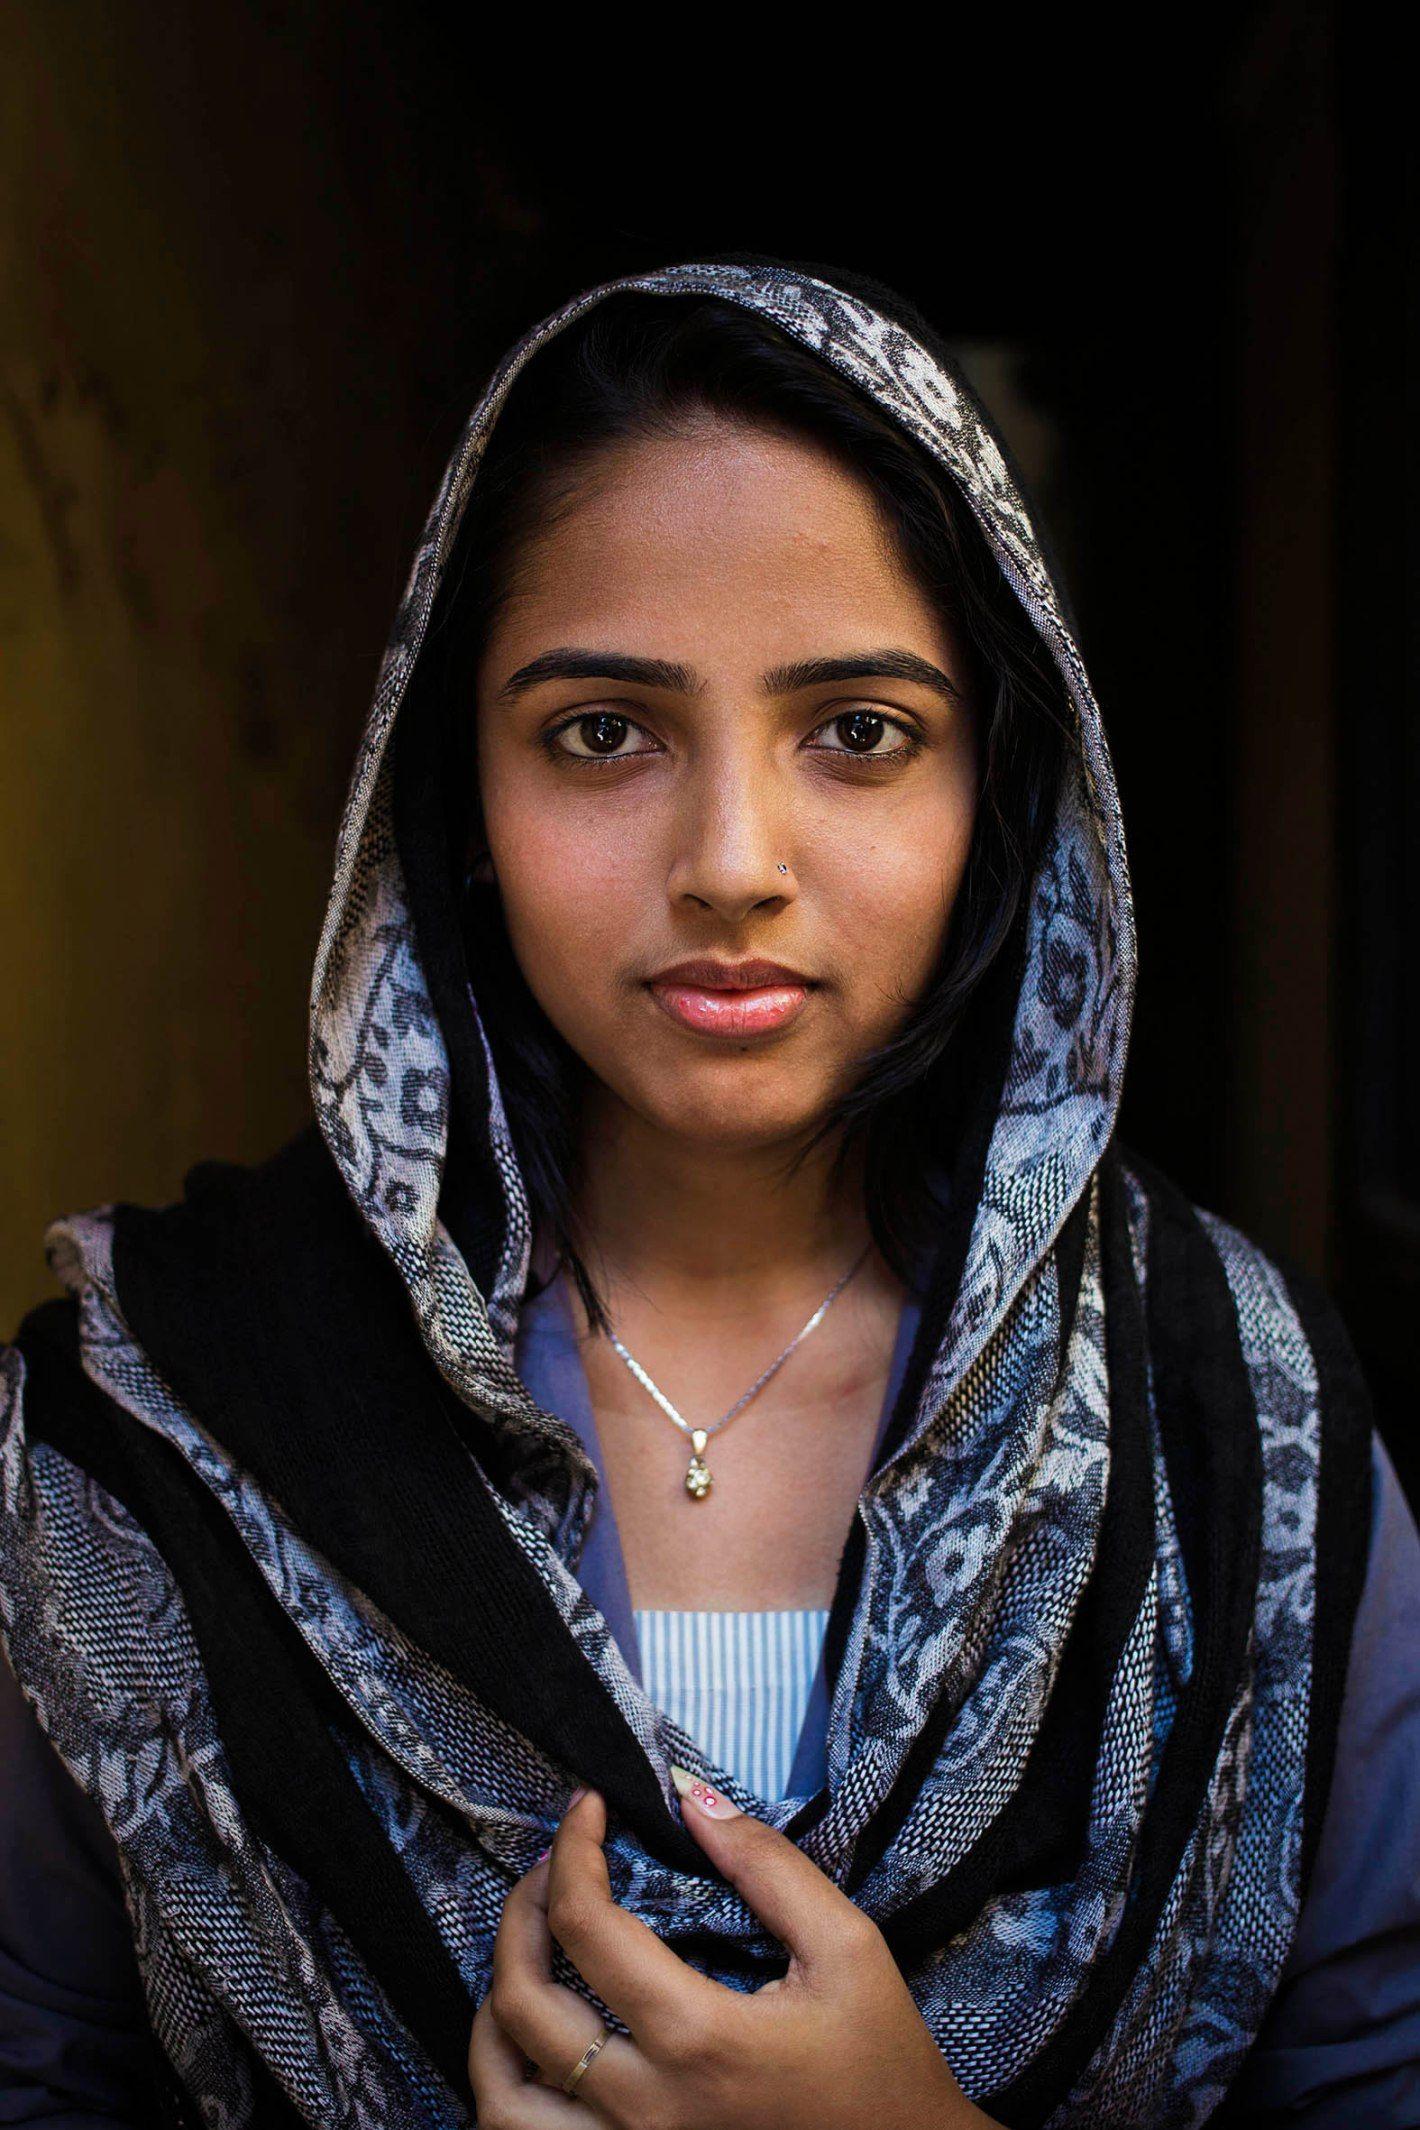 free photo indian girl portrait portrait indian pretty free